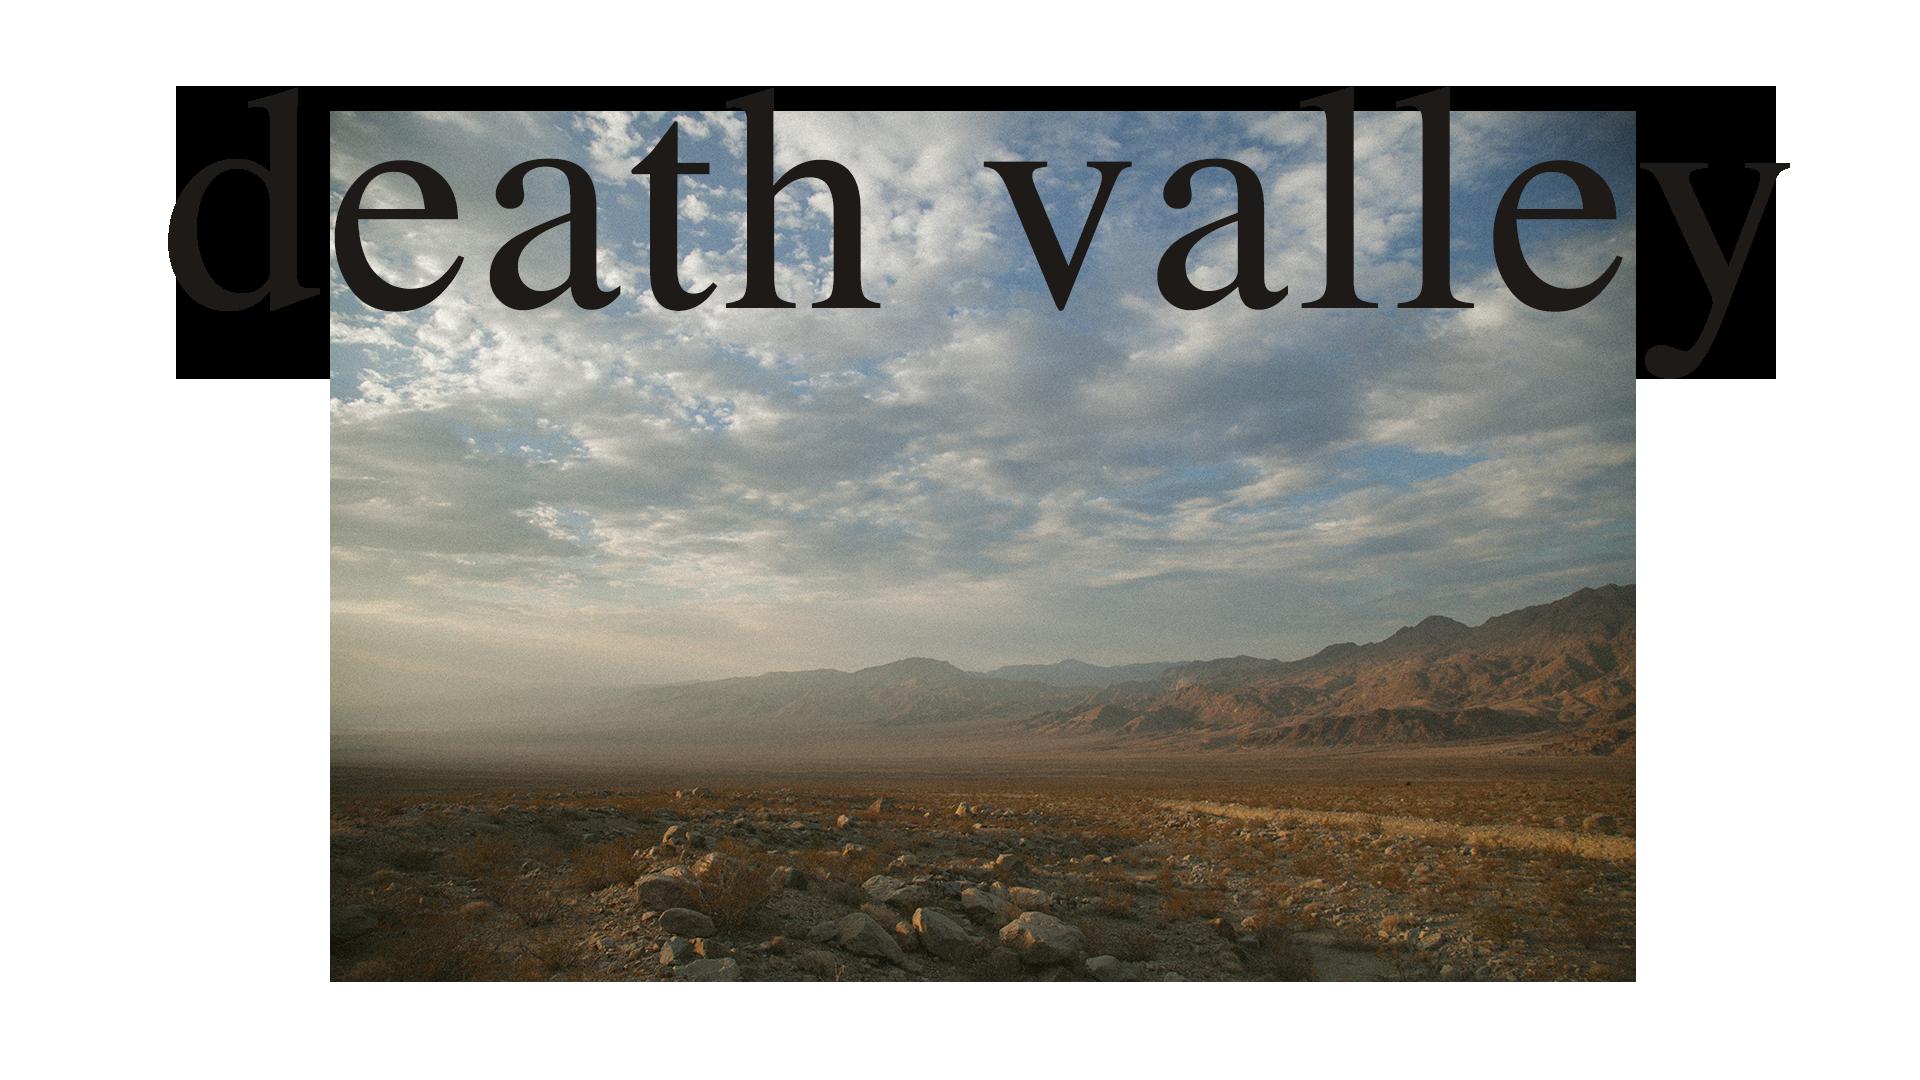 DEATH-VALLEYArtboard-4.png